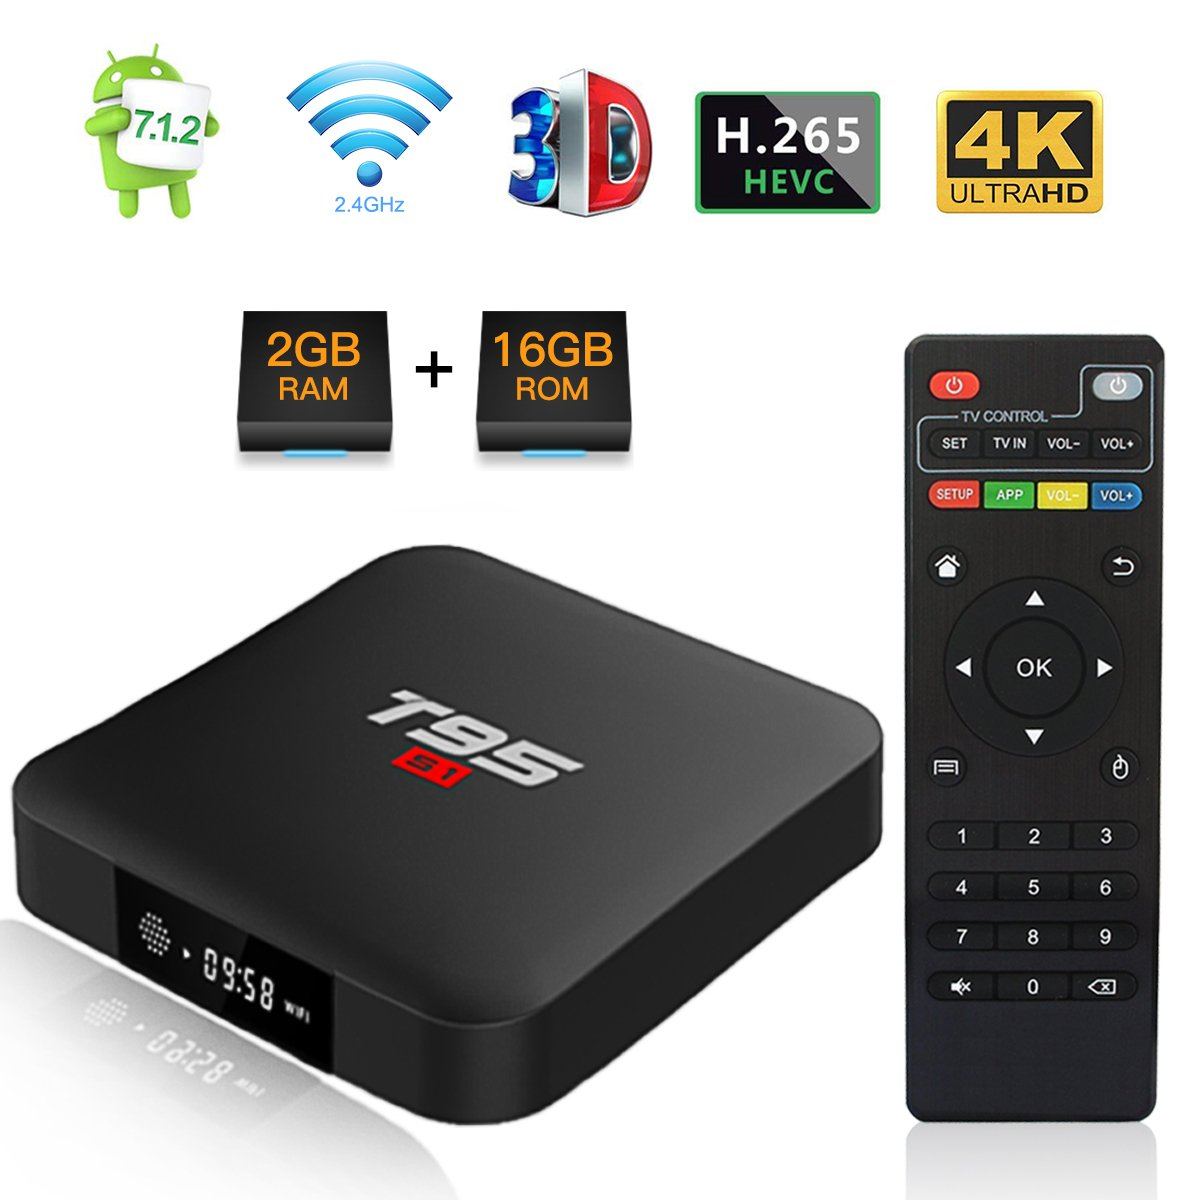 Android TV Box, T95 S1 TV Box 2GB RAM/16GB ROM Android 7.1 Amlogic S905W Quad Core con 2.4Ghz WiFi H.265 4K HDMI DLNA Media Player: Amazon.es: Electrónica